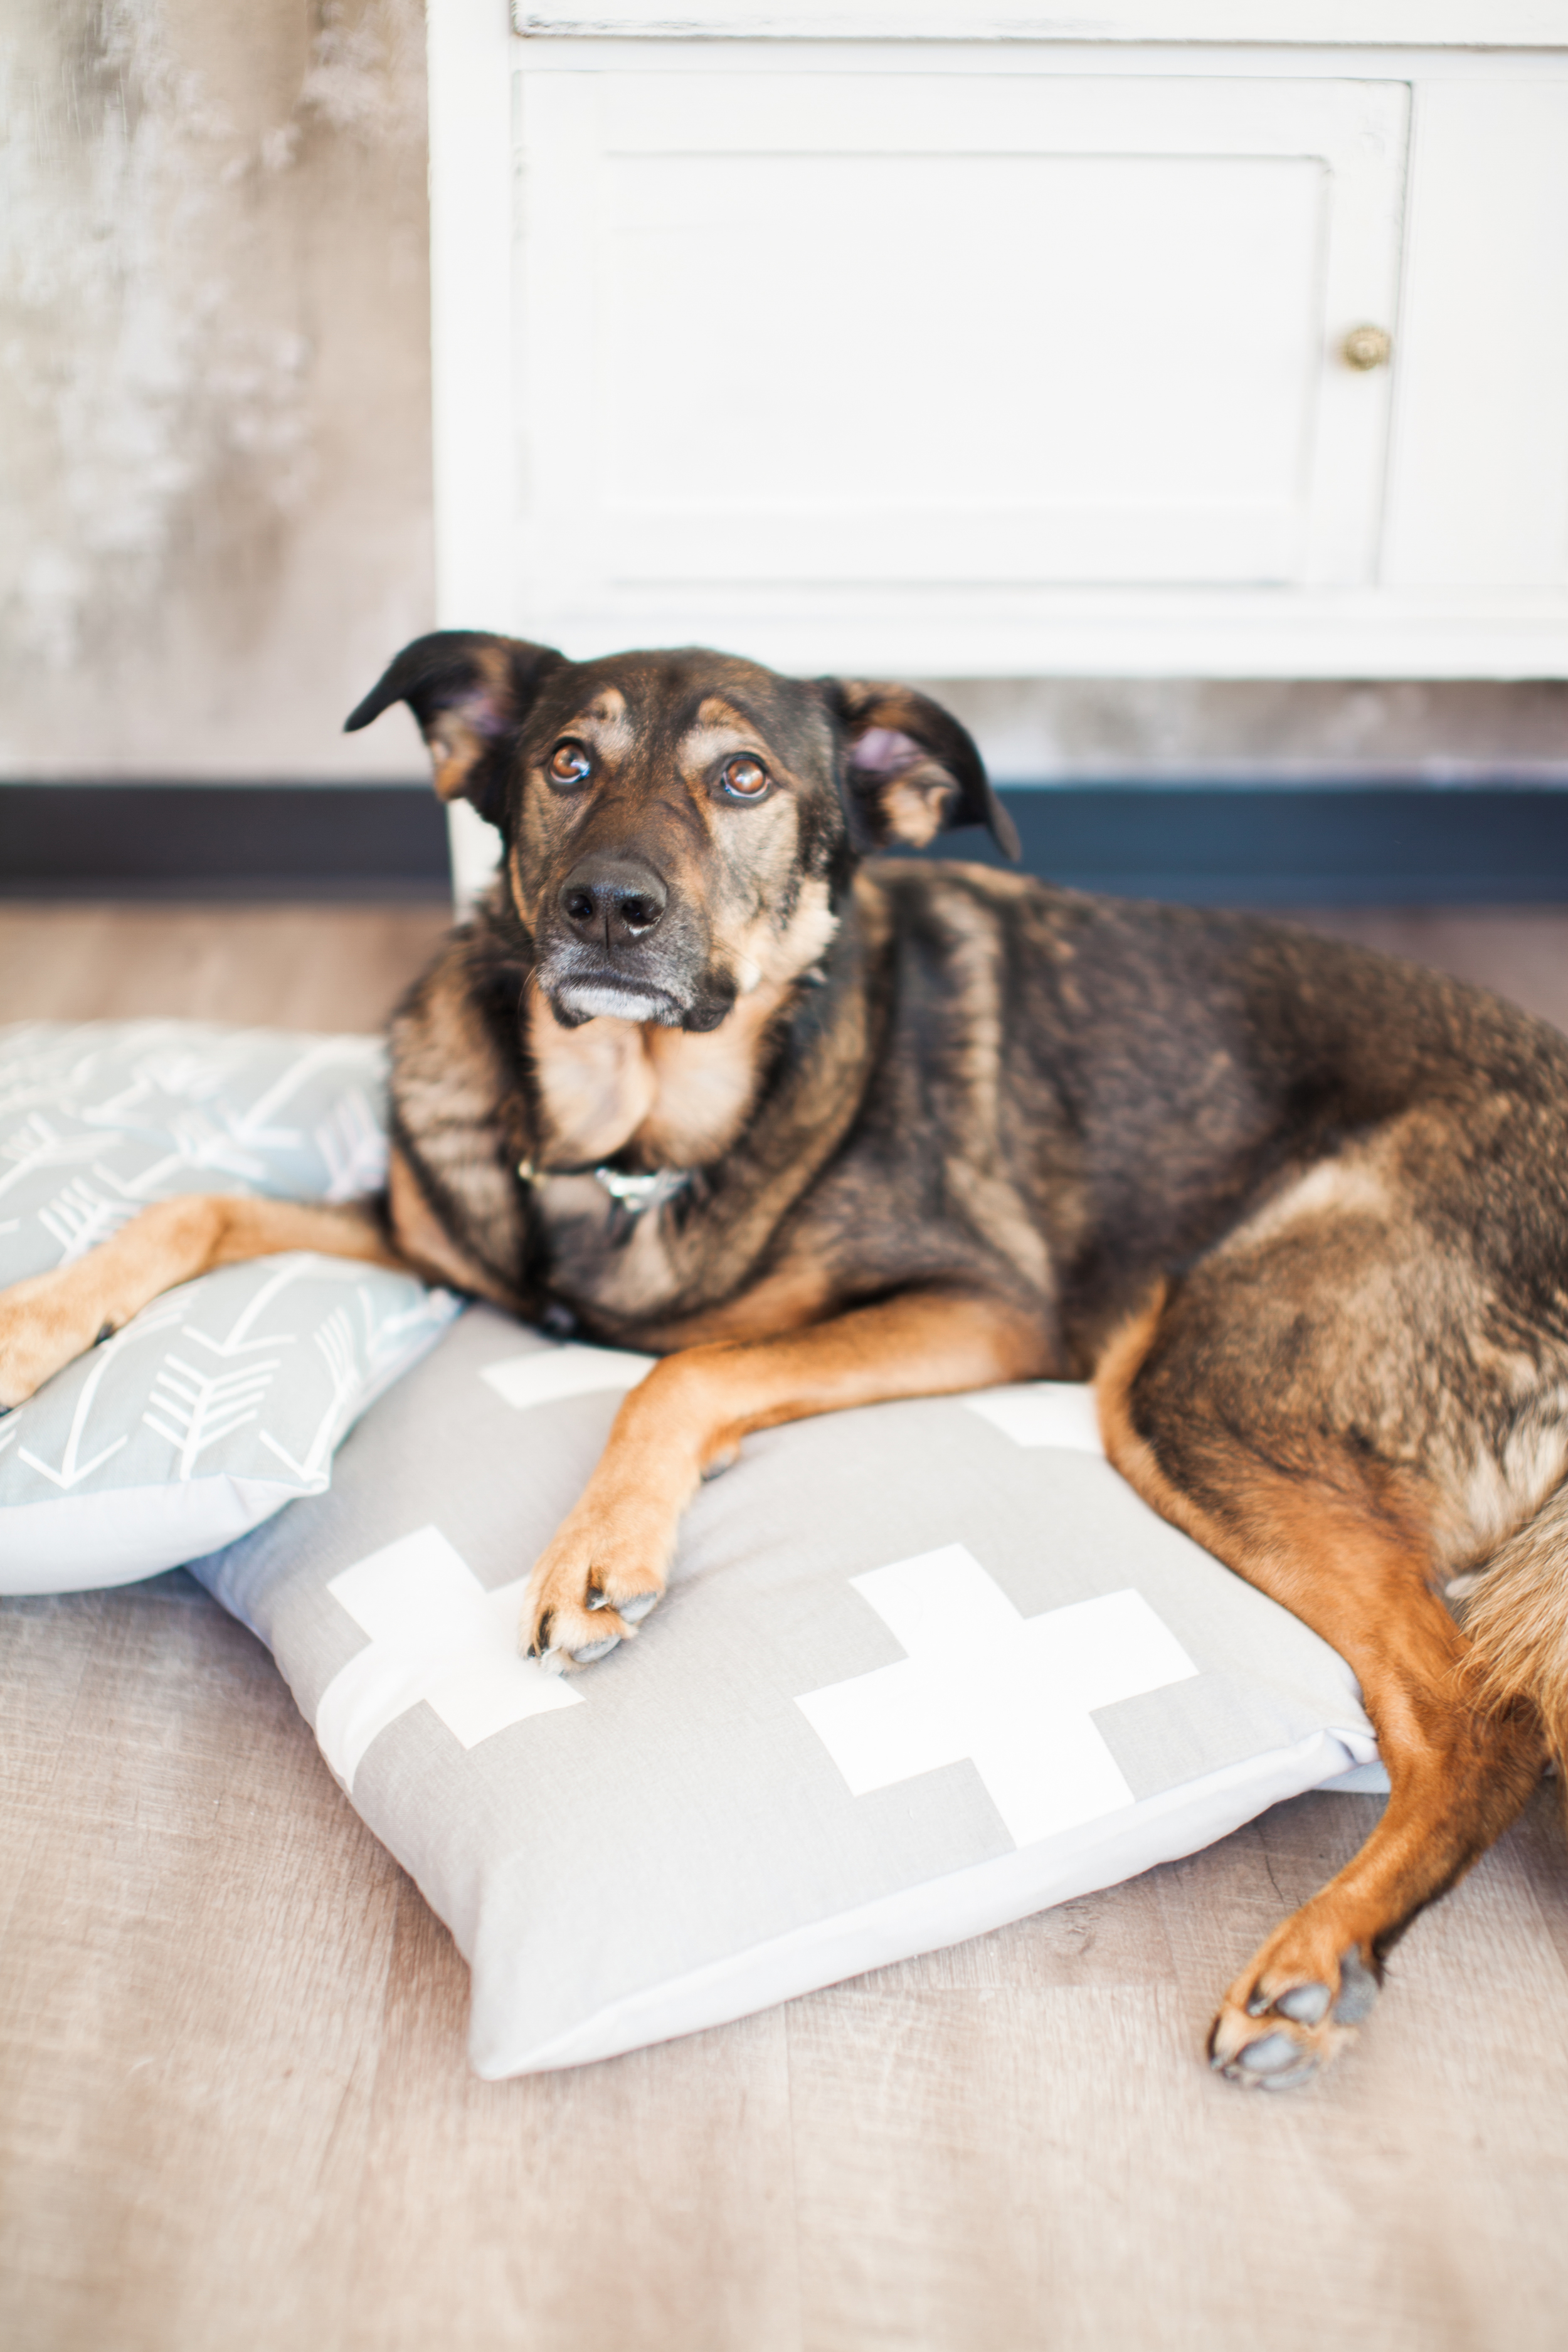 Super sweet Leroy cozying up on M&H Decor dog beds.